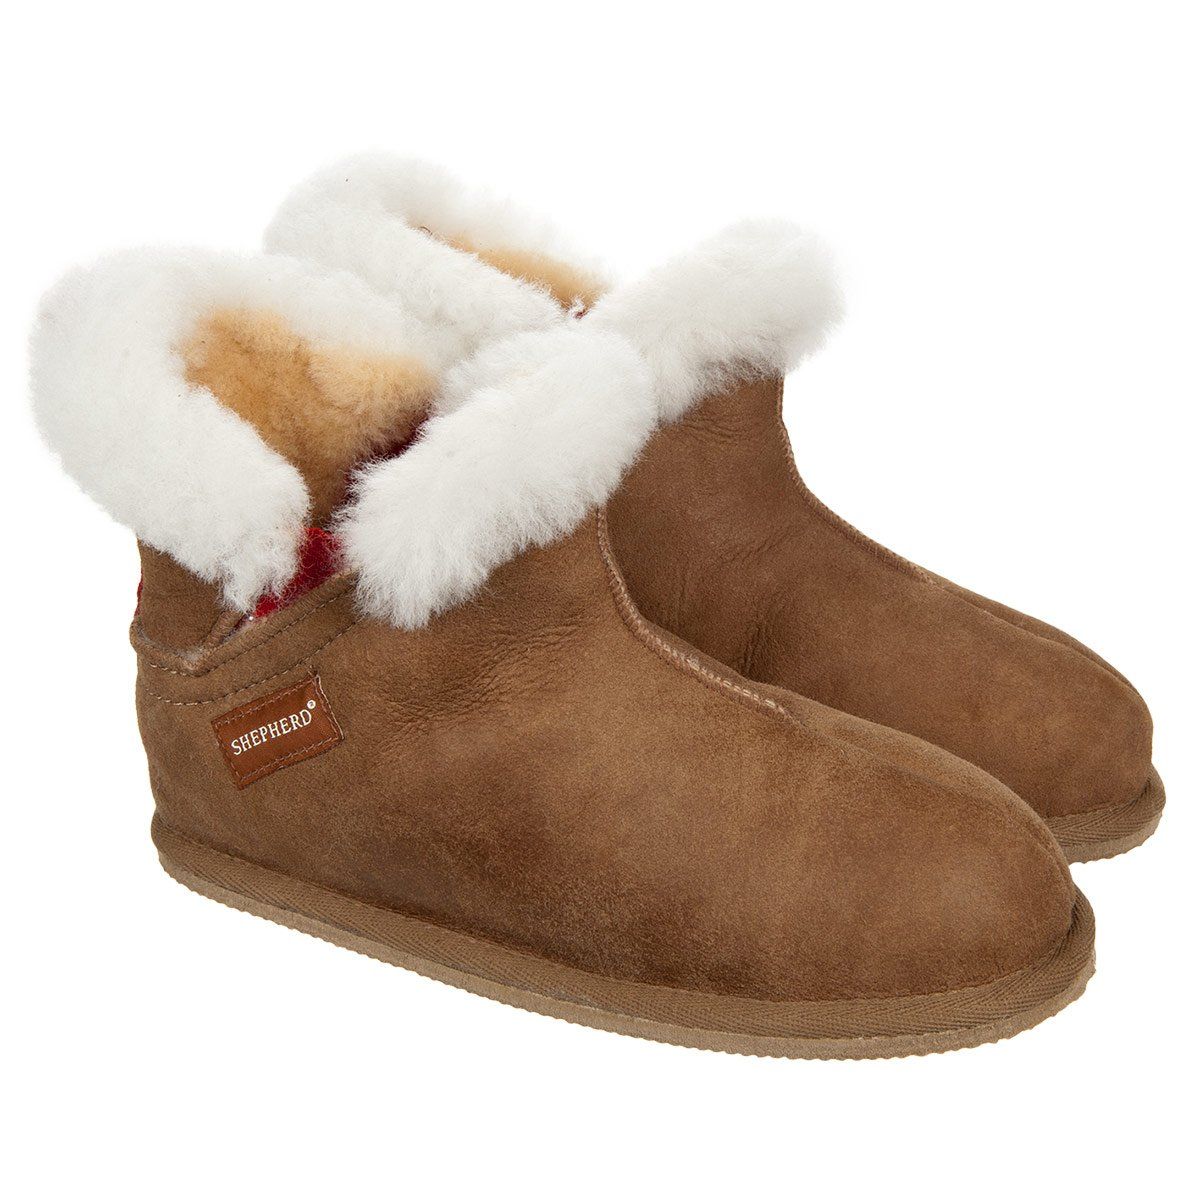 The slippers for women by Bela Shepherd in sheepskin and non-slip soles